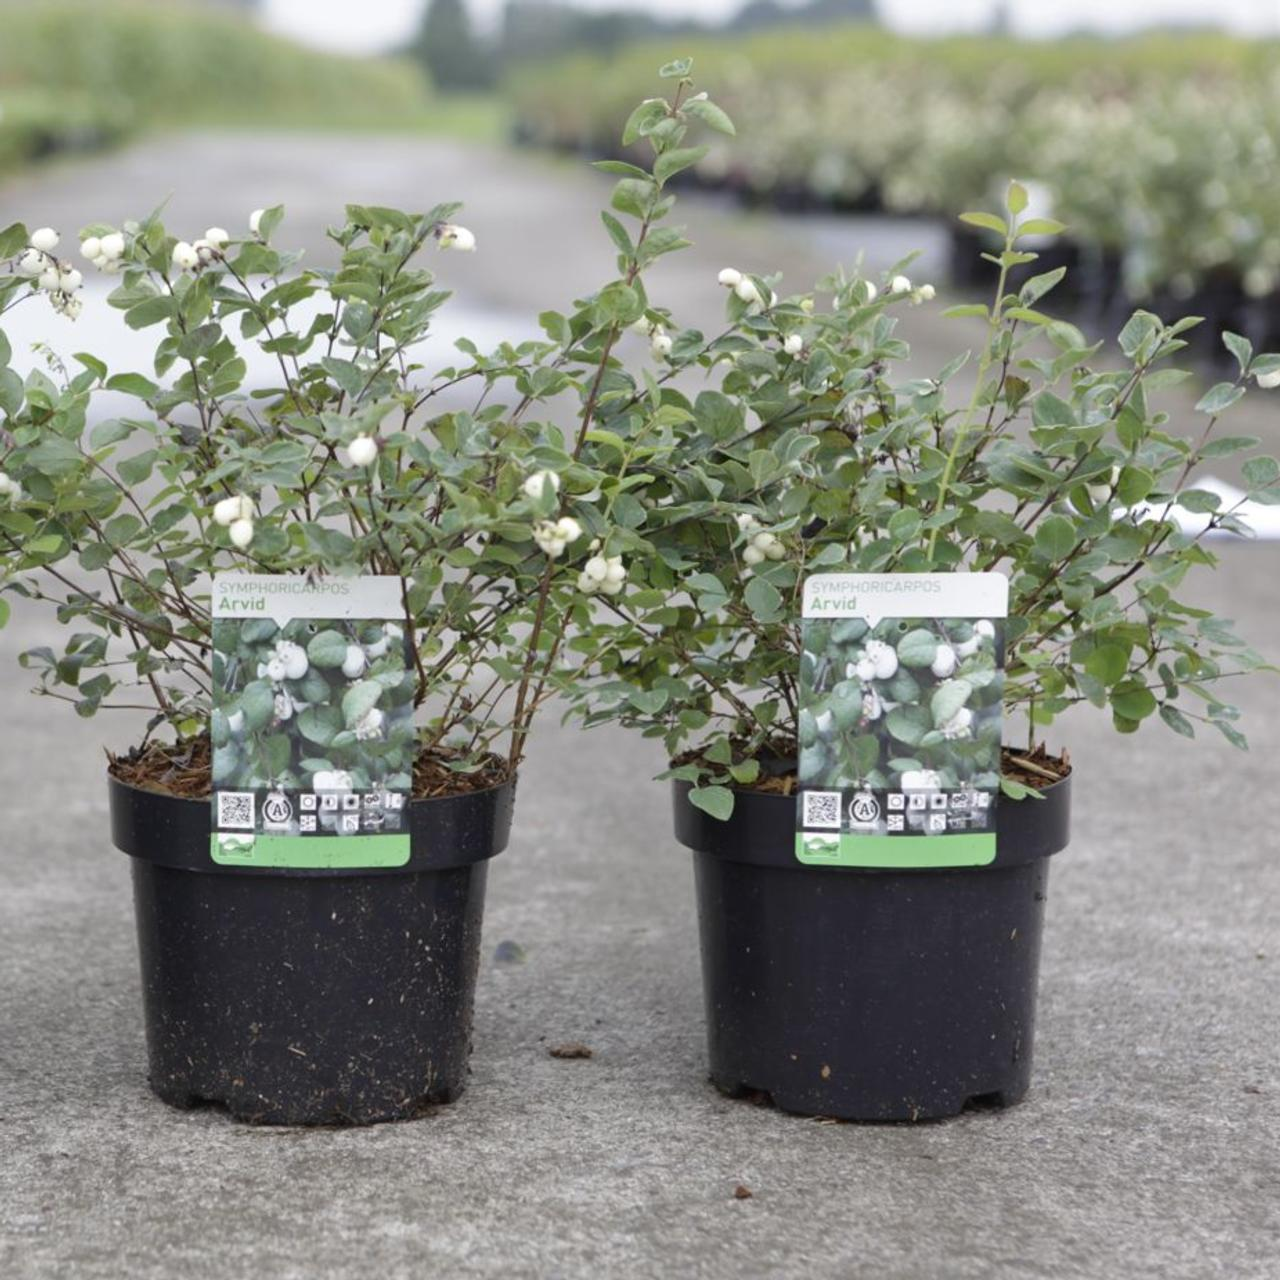 Symphoricarpos 'Arvid' plant